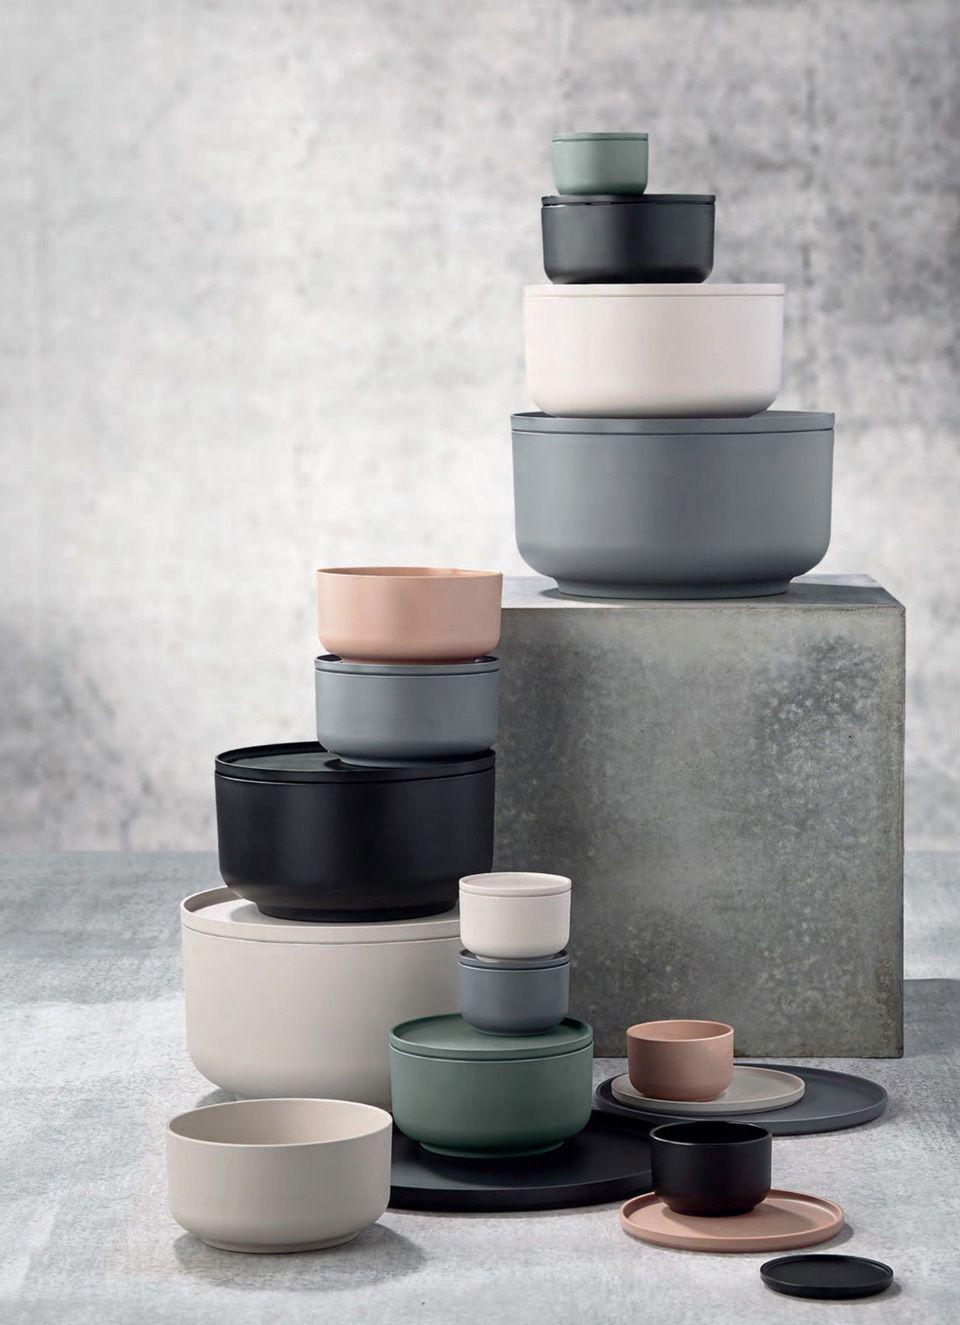 lerke la boutique d co scandinave shopping deco home decor shopping pinterest deco. Black Bedroom Furniture Sets. Home Design Ideas